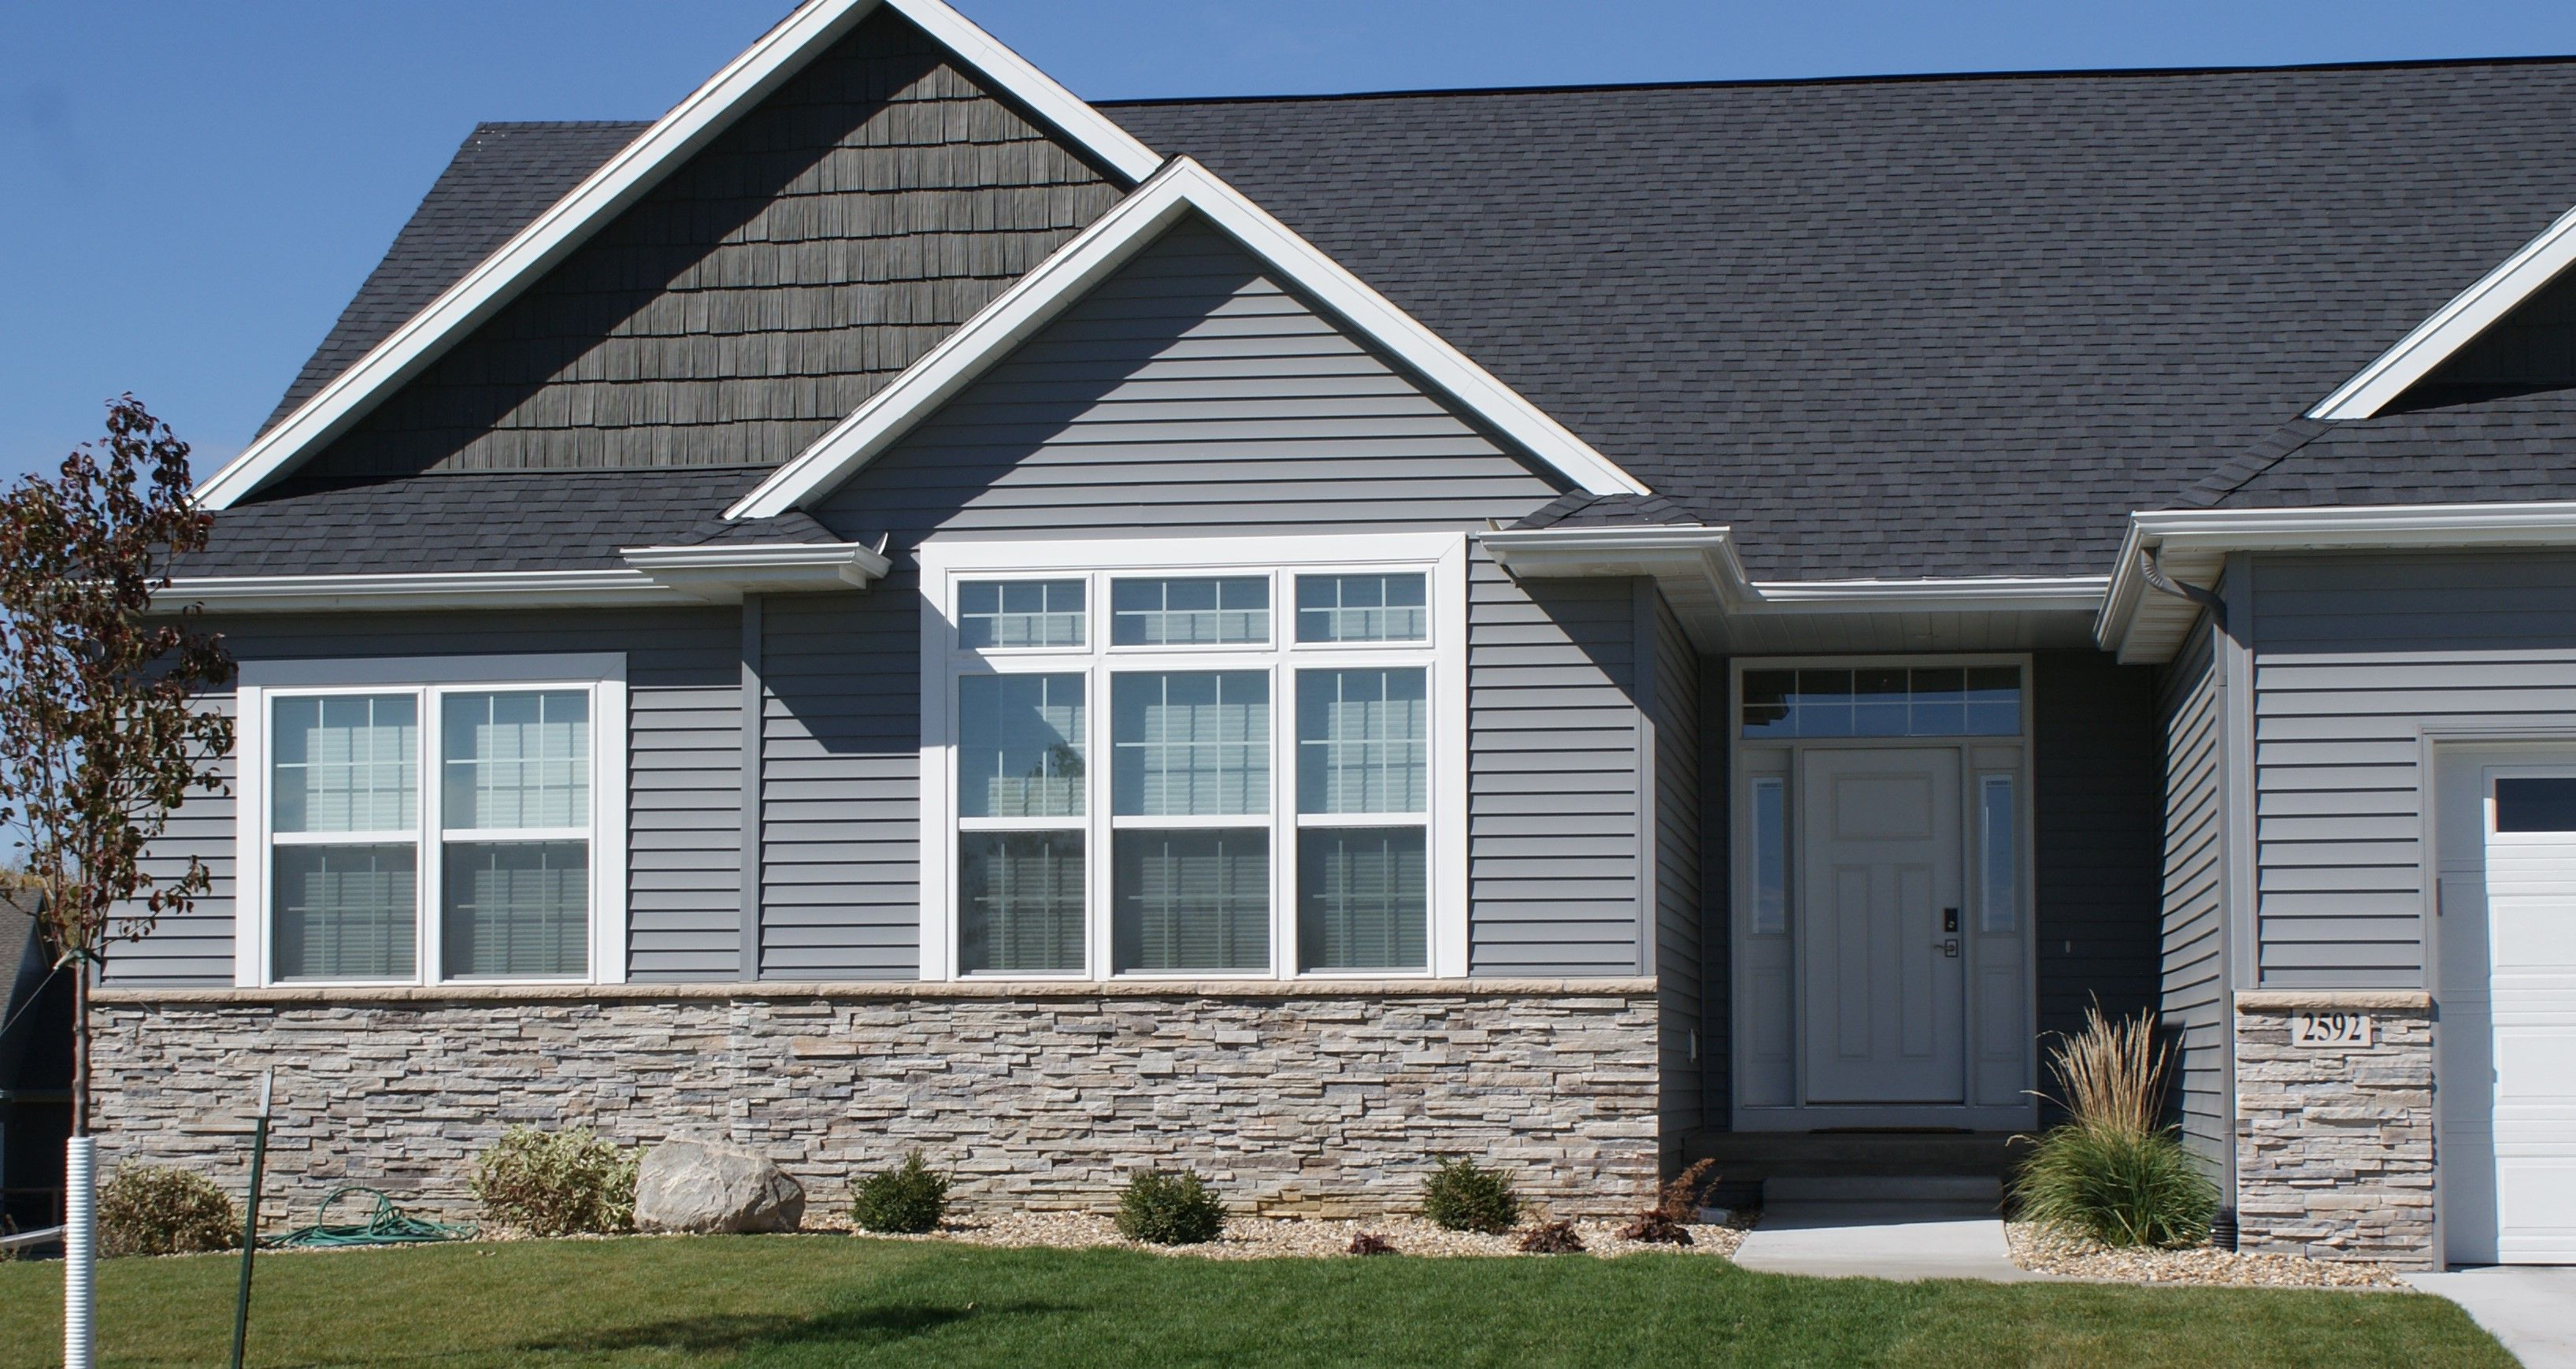 Echo Ridge Pro Fit Alpine Ledgestone Cultured Stone Stone Boral Usa Stone Verneer House Exterior Stone Panels Exterior Exterior House Colors